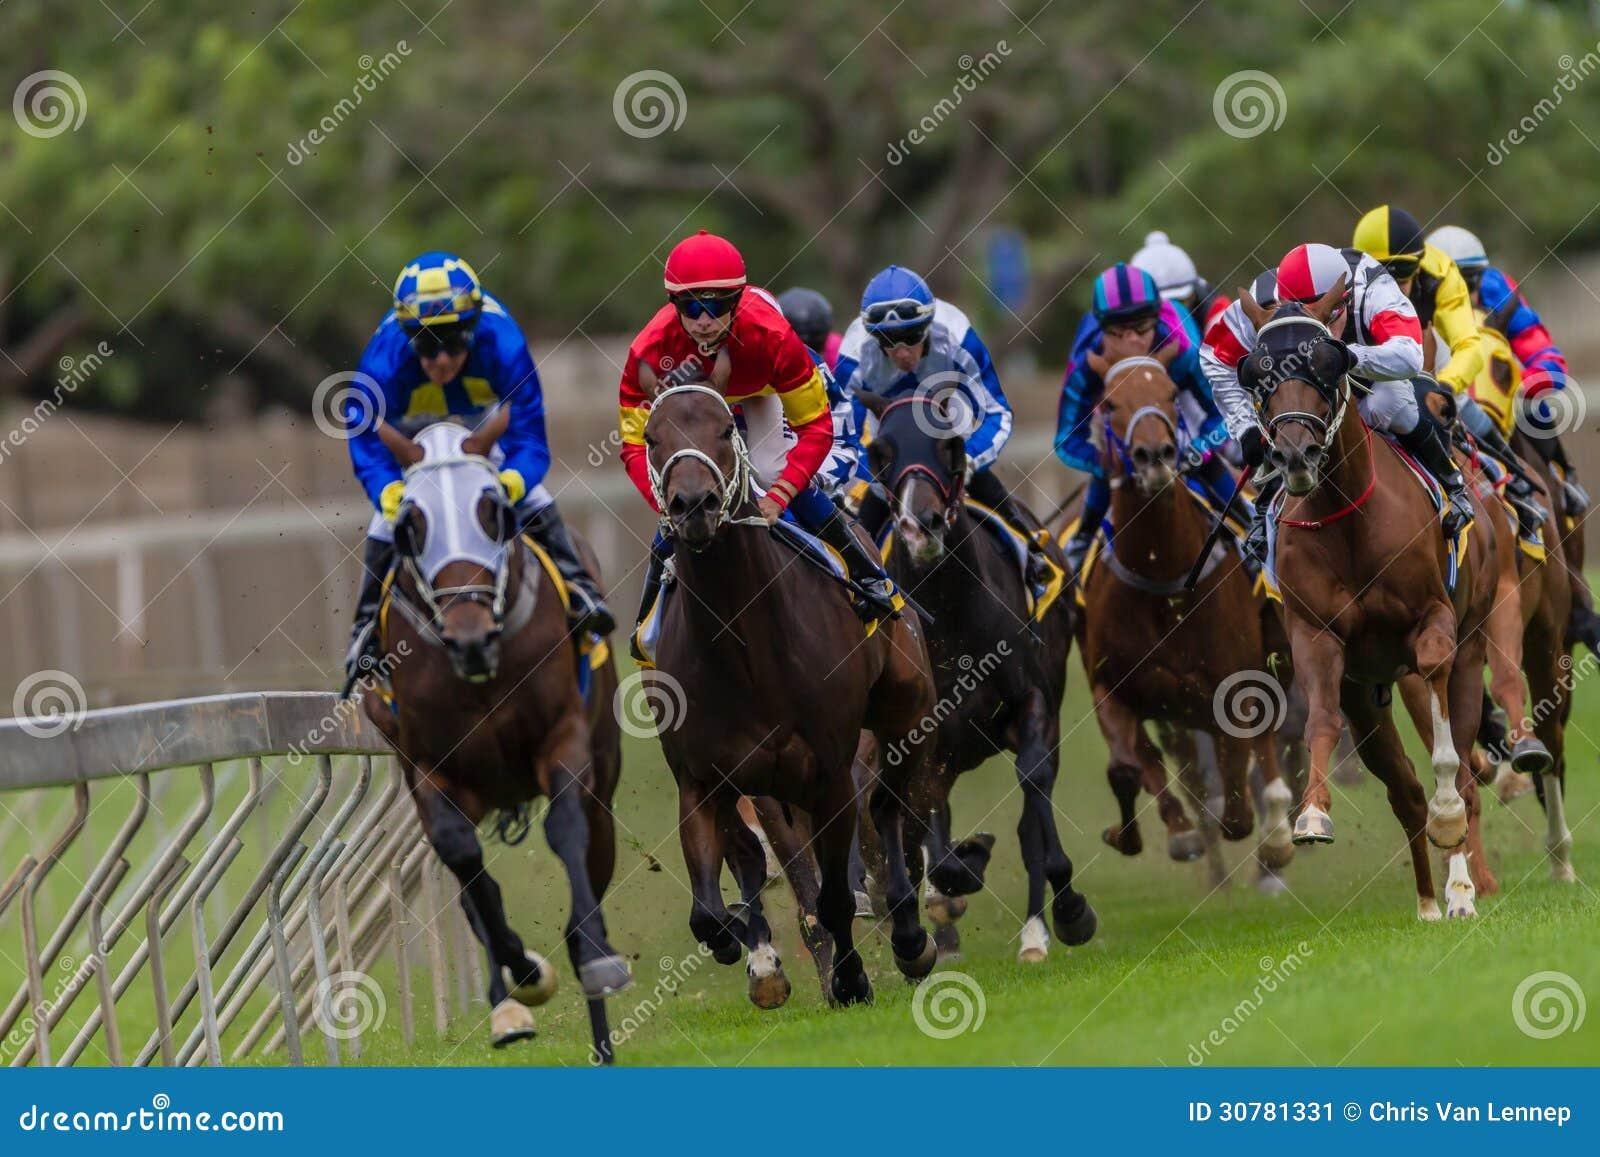 Greyville horse racing betting mine bitcoins freebsd